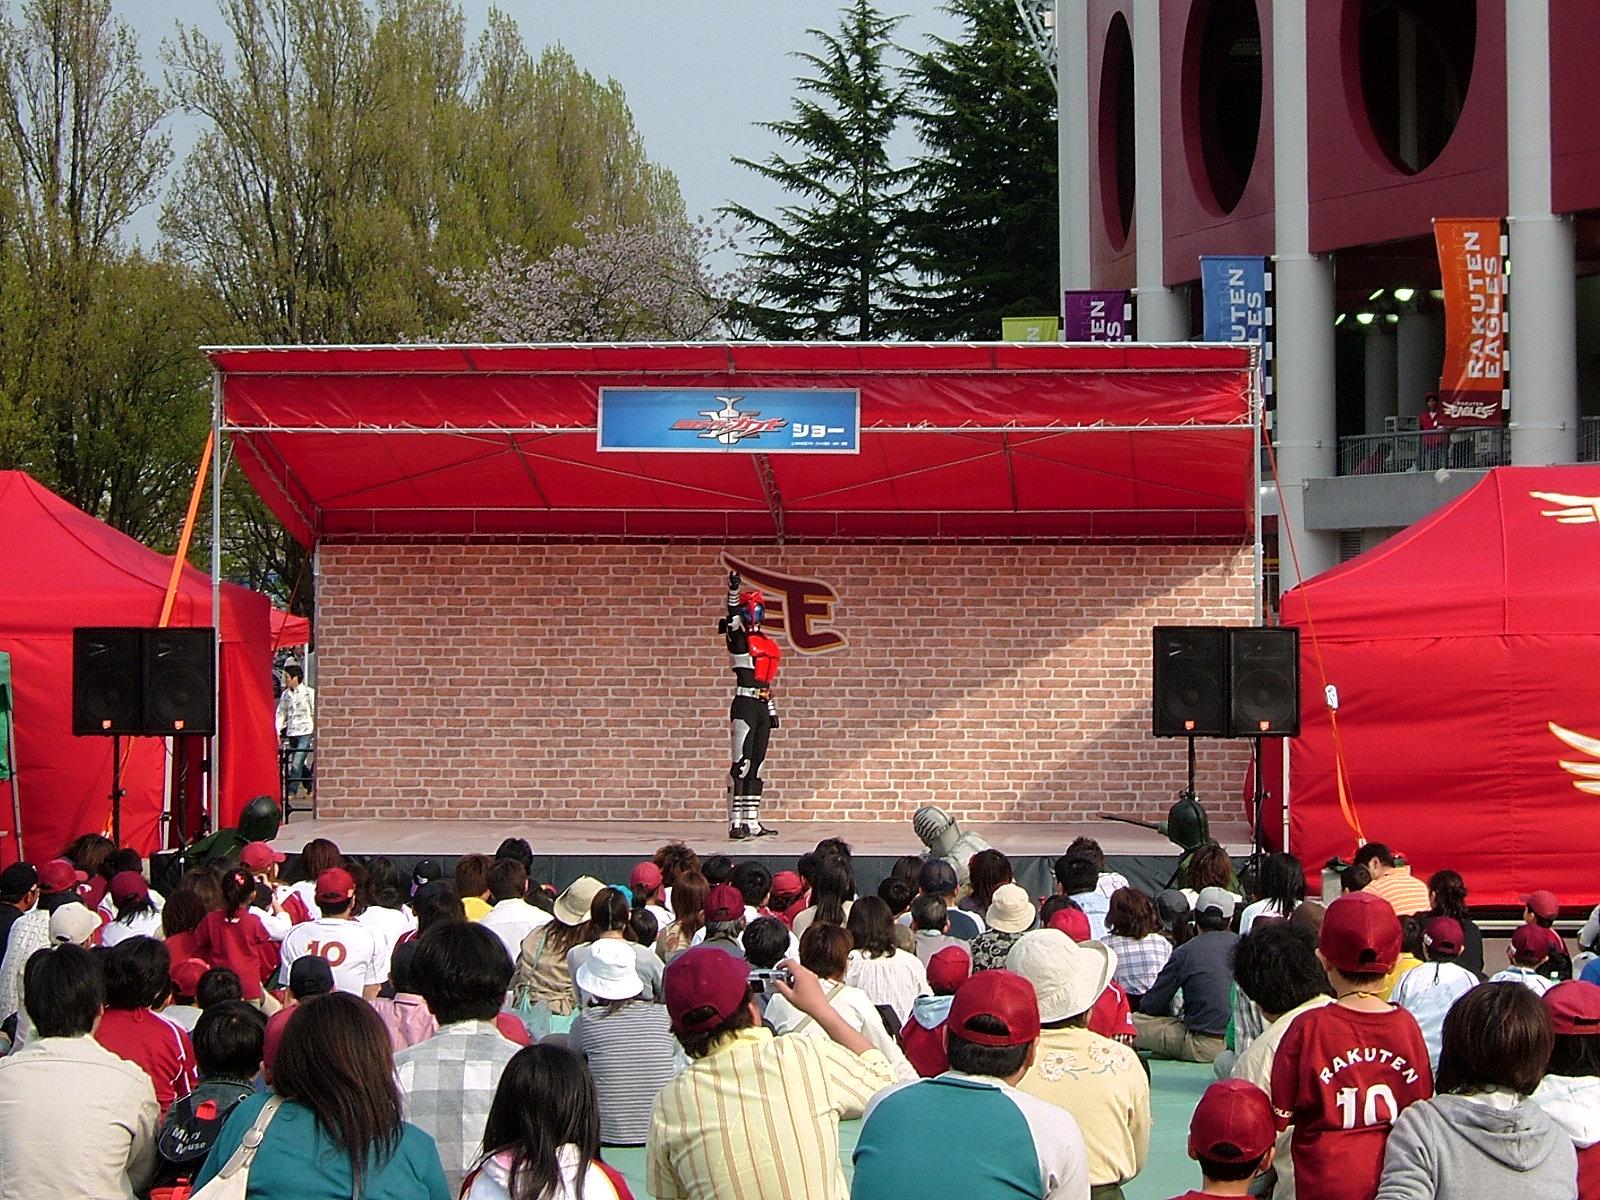 File:Kamen Rider Kabuto (141830668) jpg - Wikimedia Commons